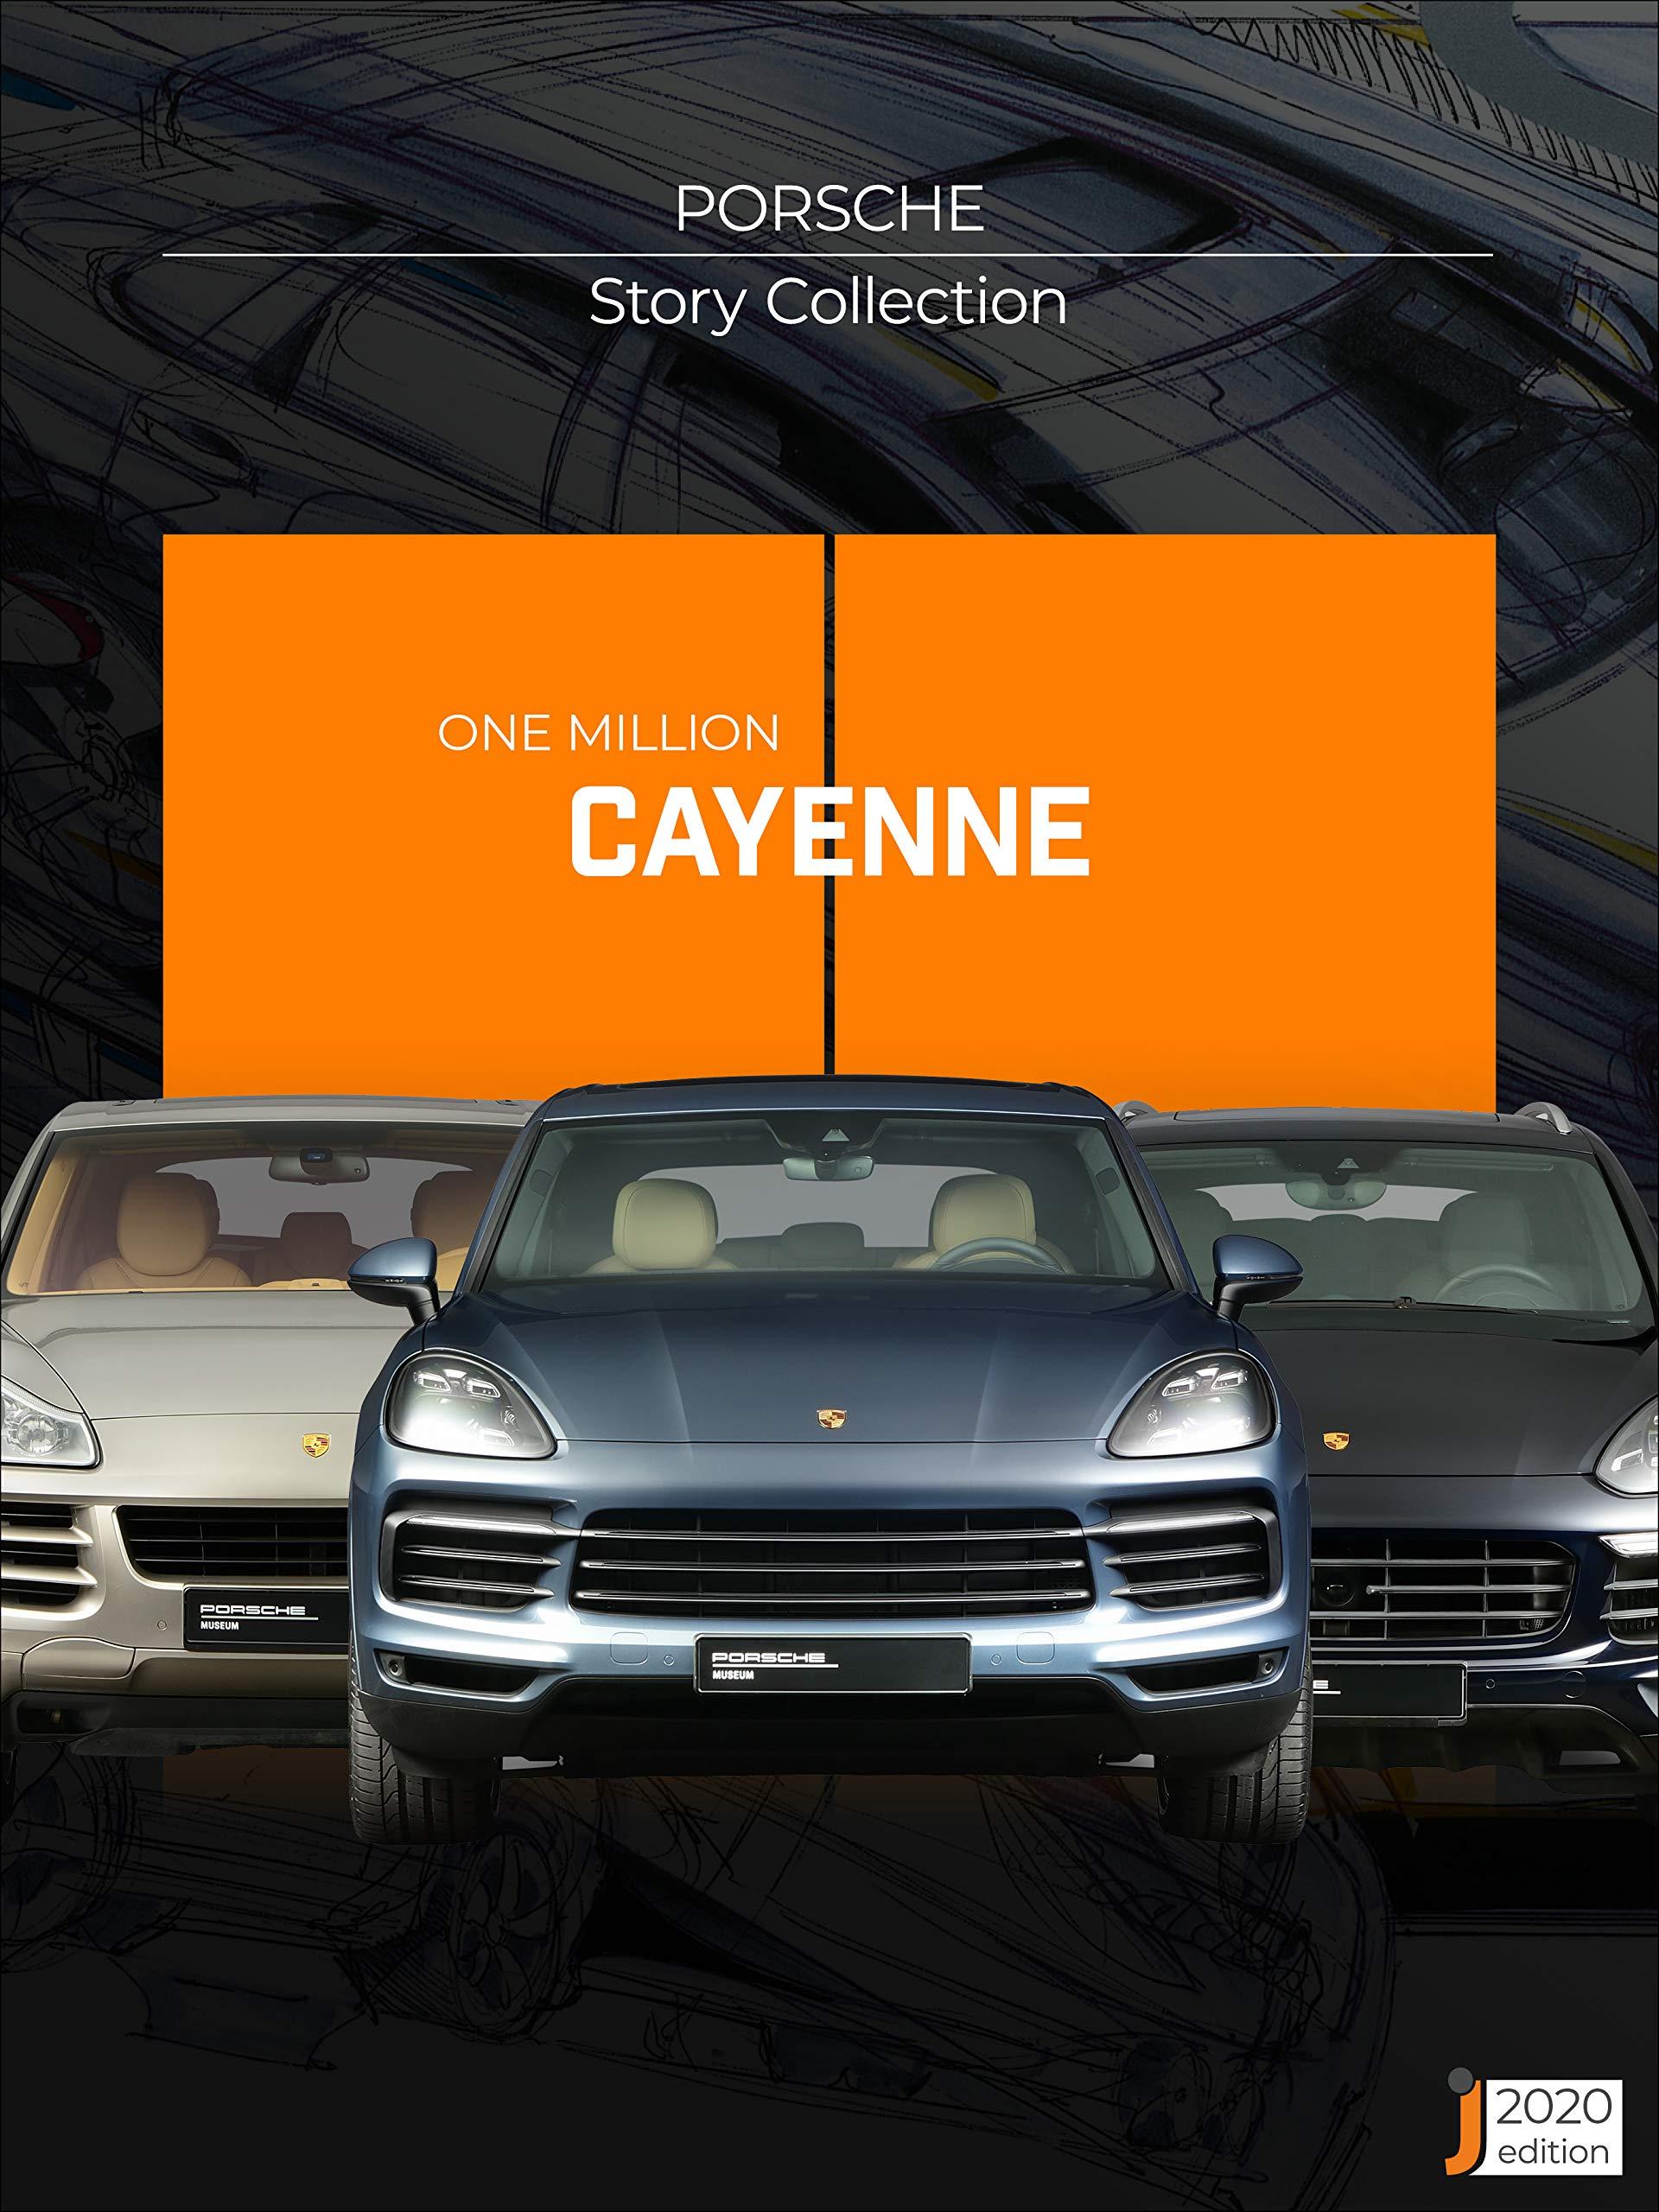 One Million Cayenne | Porsche Story Collection on Amazon Prime Video UK